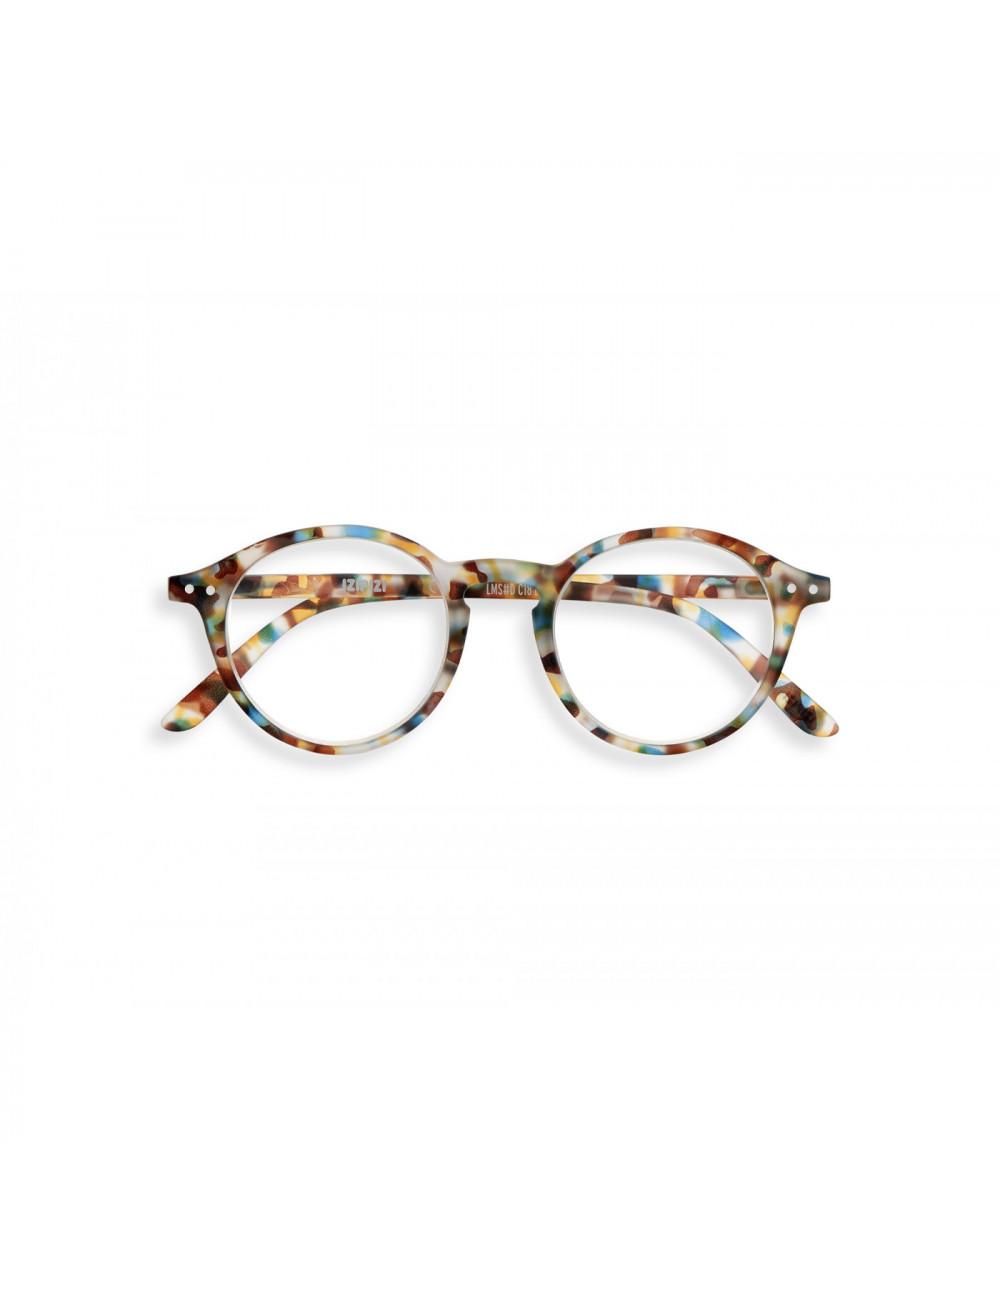 Leesbril D | blue tortoise